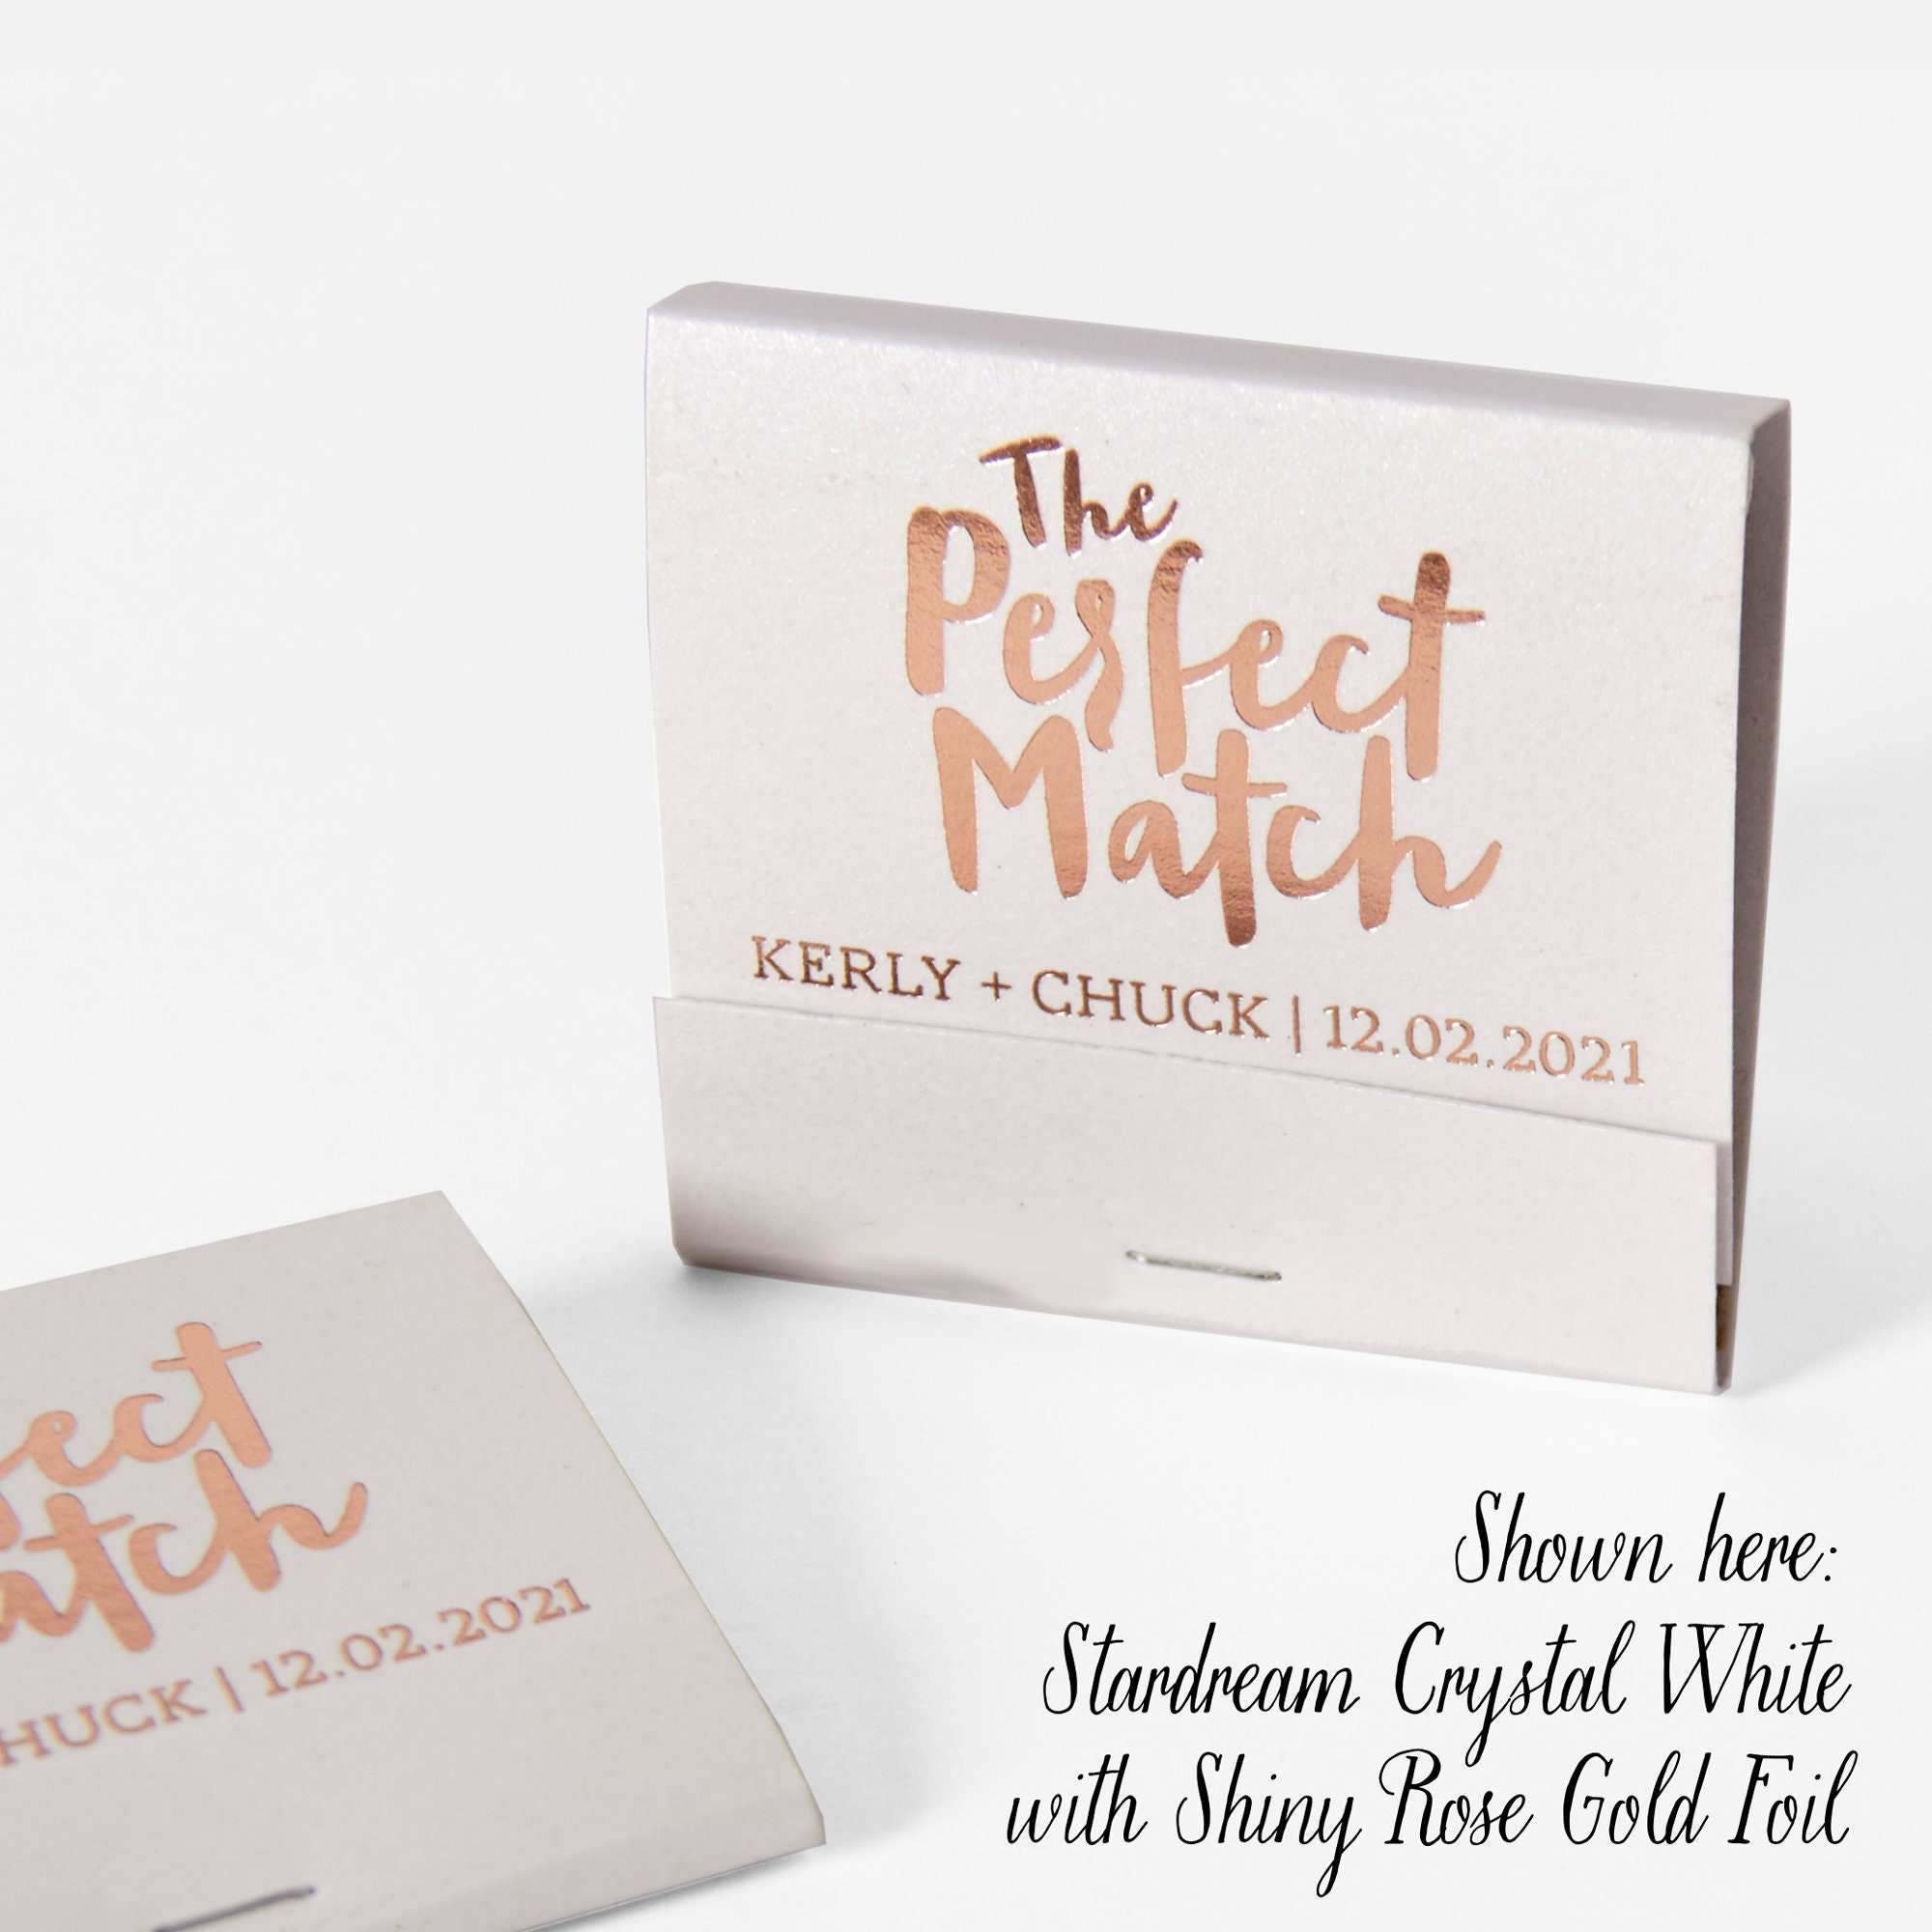 THE PERFECT MATCH Matchbooks Wedding Favors Wedding